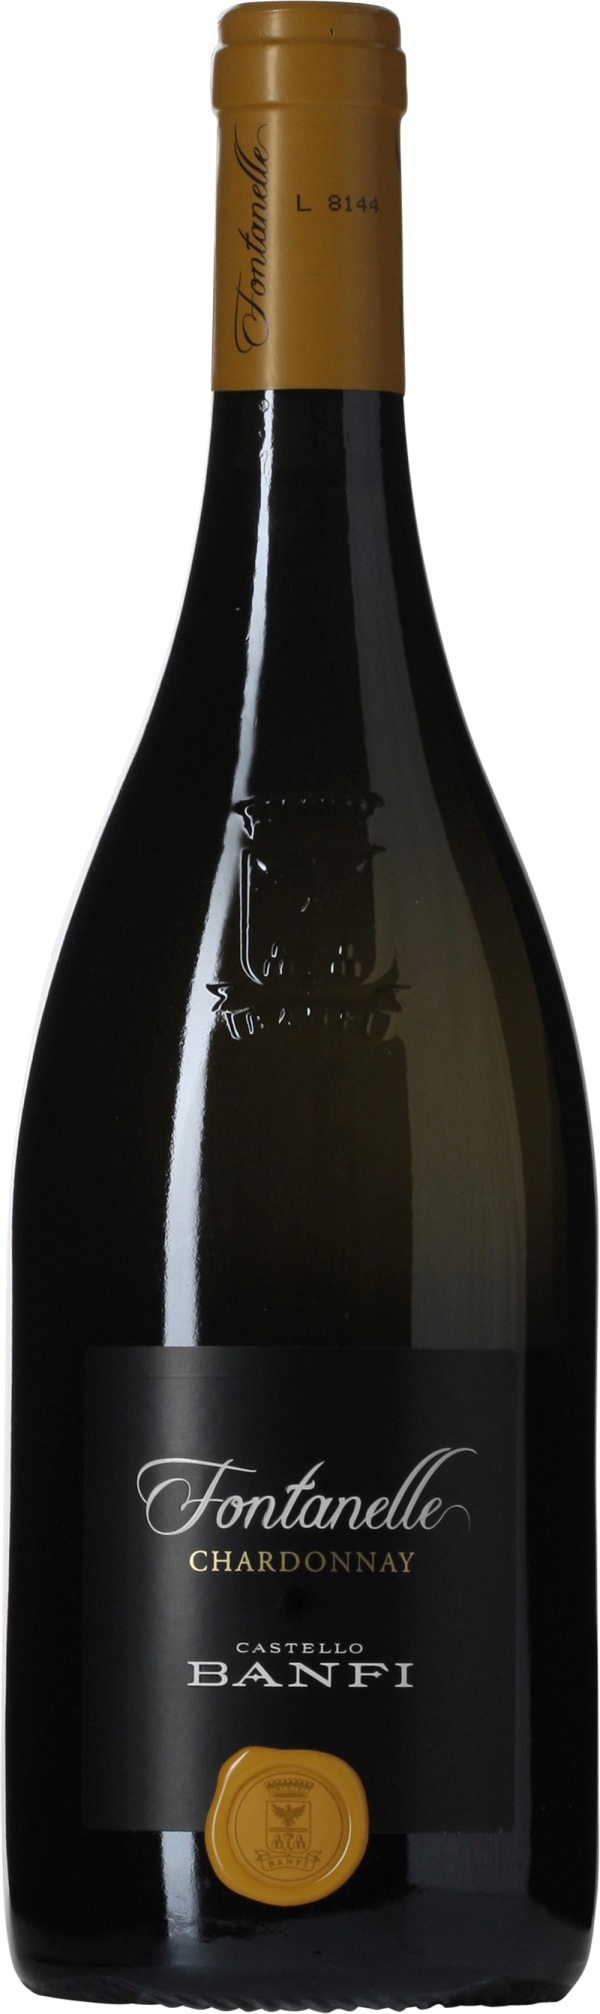 Banfi Fontanelle Chardonnay 2017